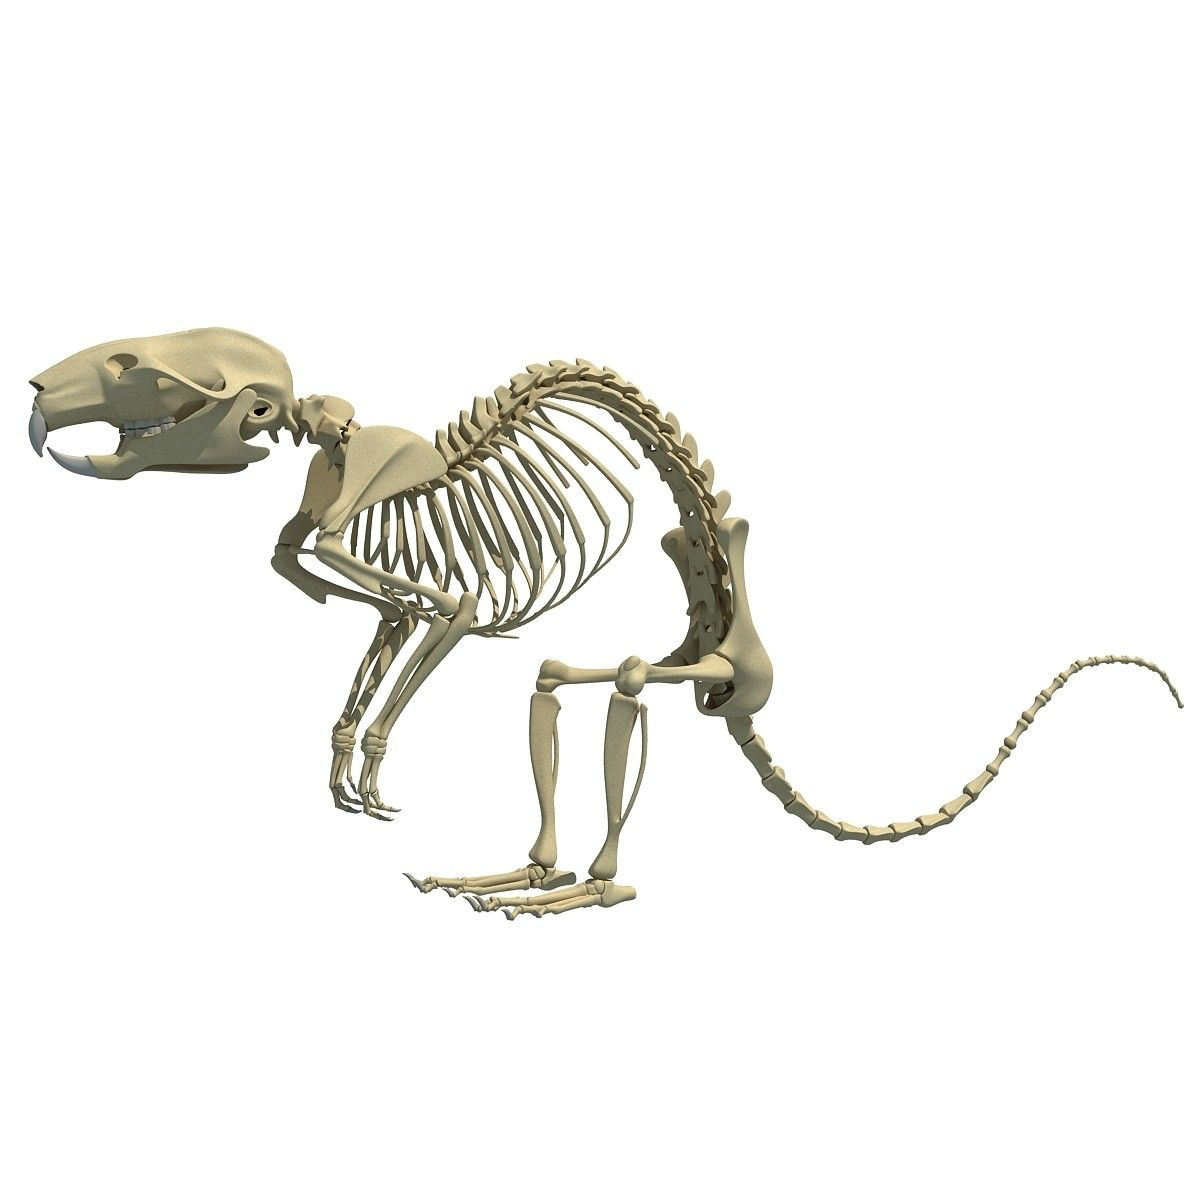 Rat Skeleton Rat 3dskeleton Model